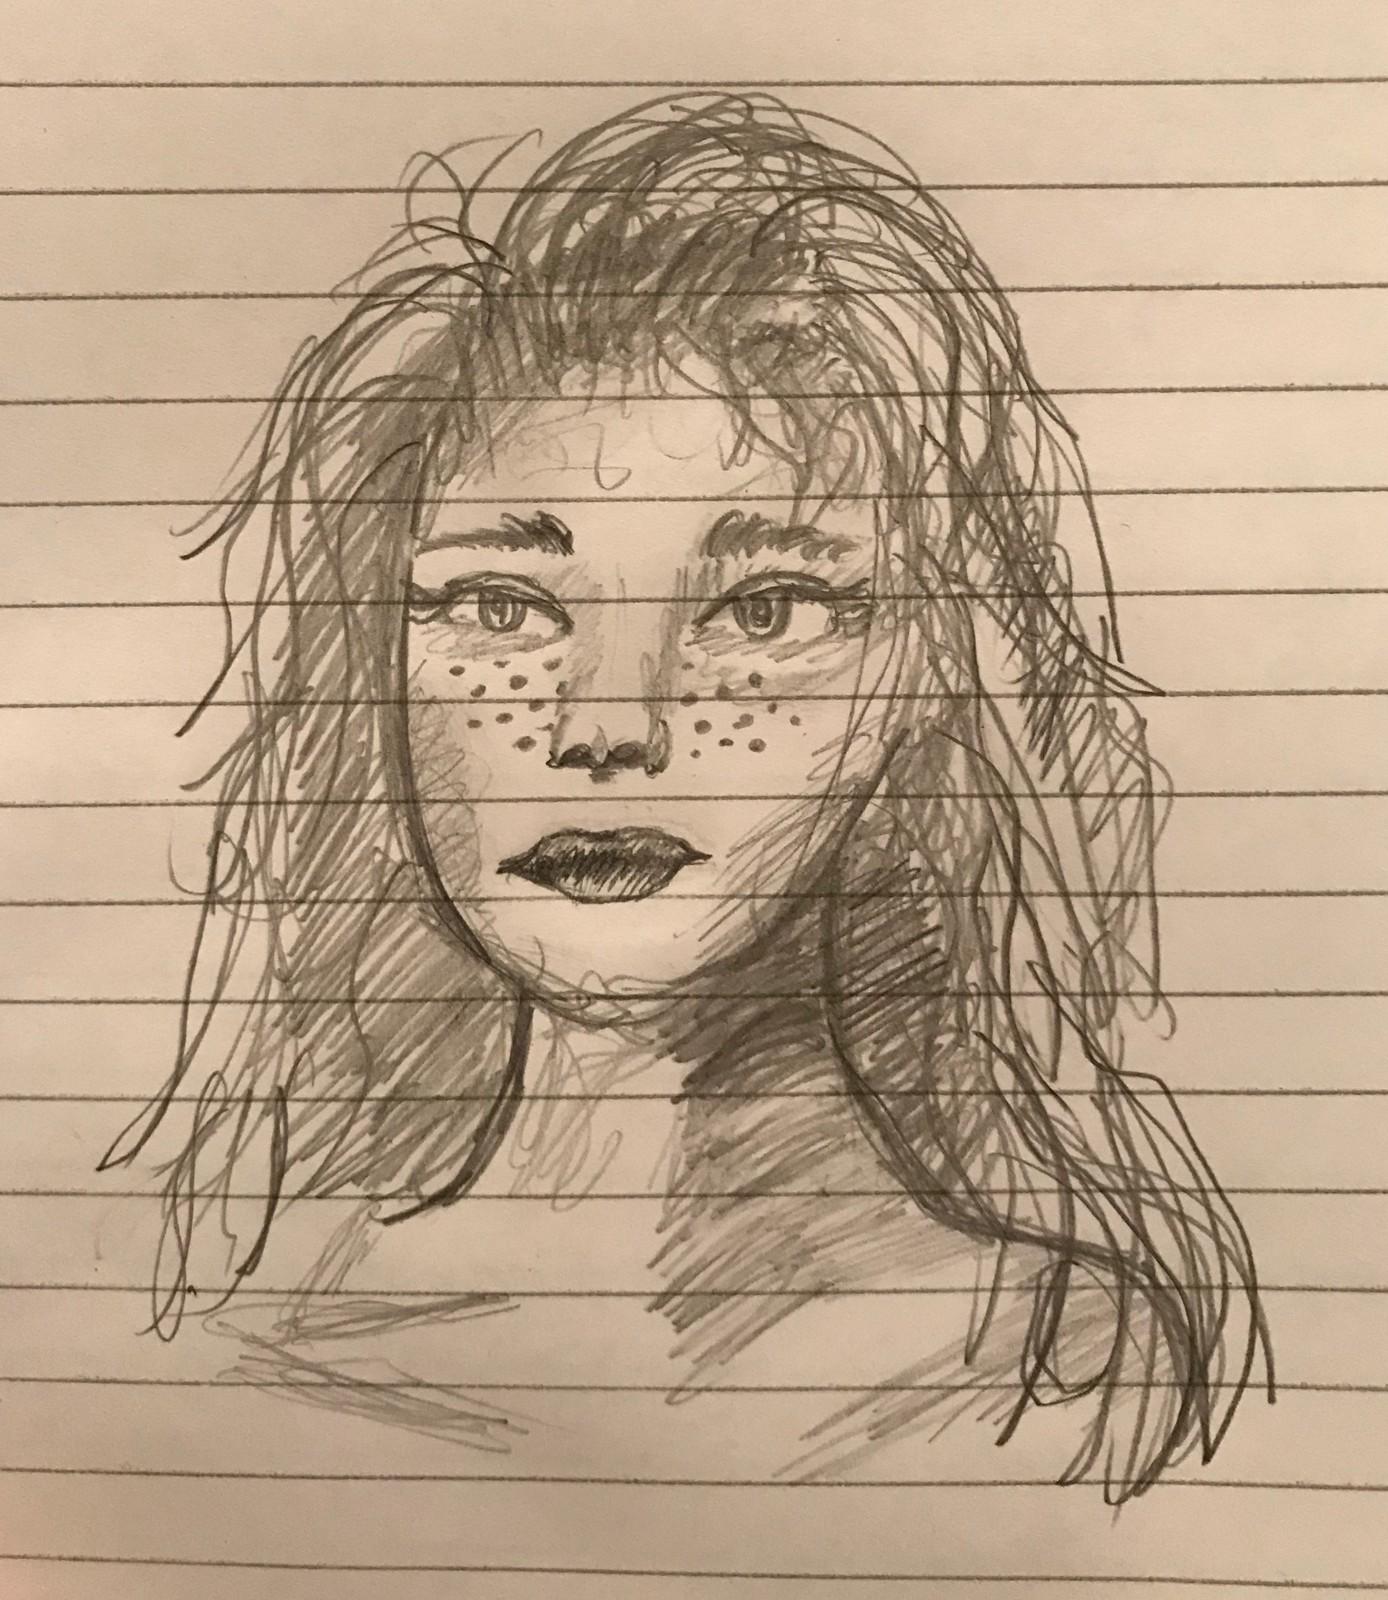 Stylized Female Head Sketch